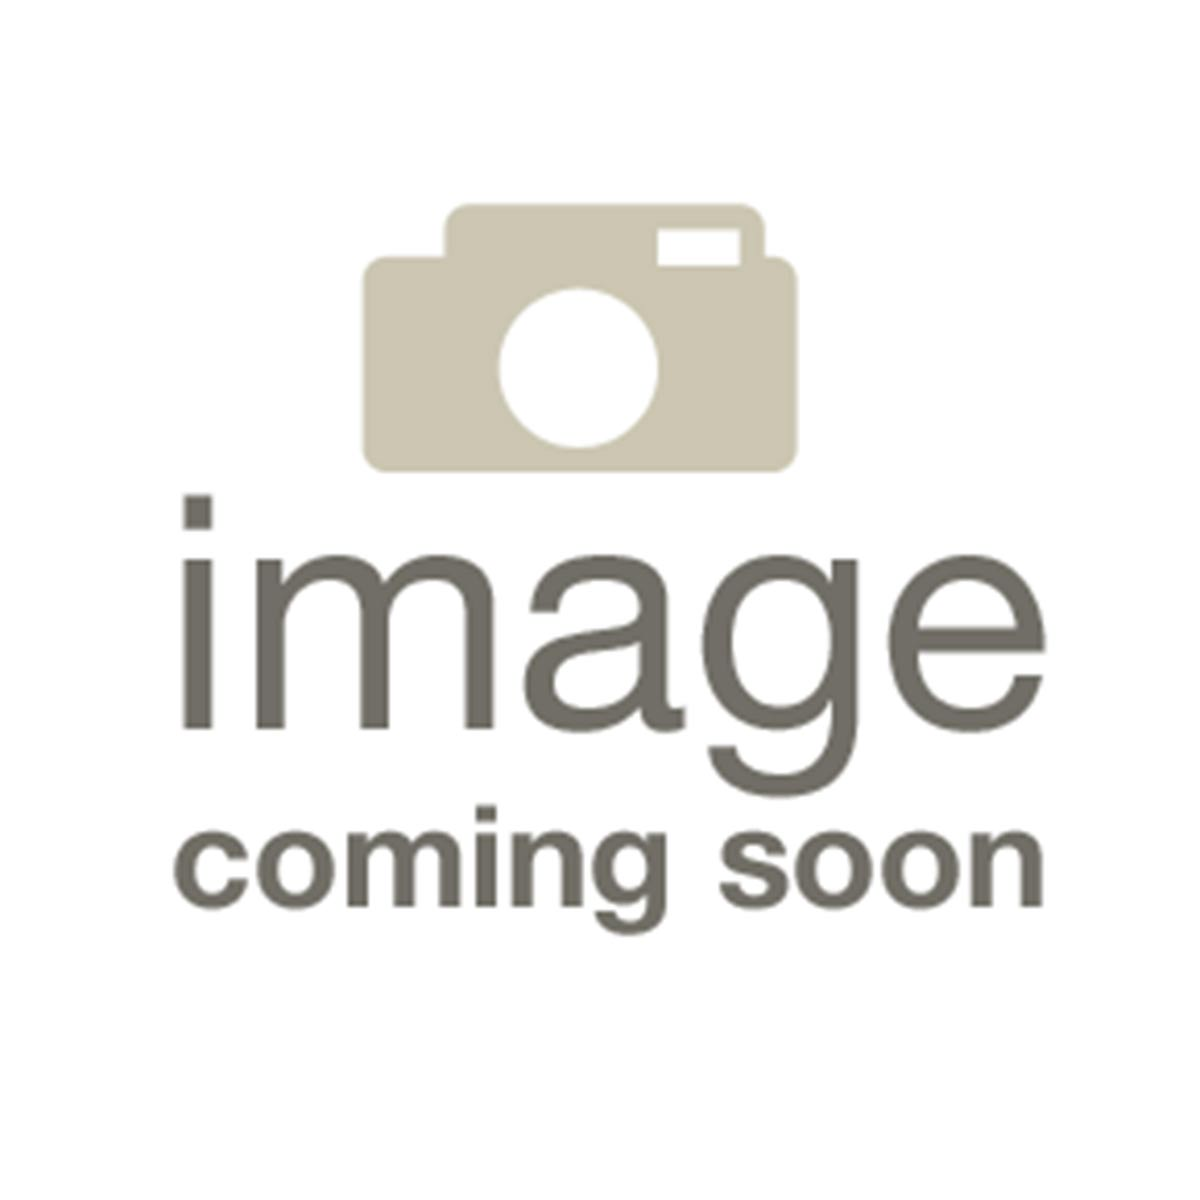 Denim Leggings - Ankle Length w/ Back Pockets J04 Purple Plus 2 Pack Denim Leggings - Ankle Length J04 ) - 1 (Fits 14-16) 1 (Fits 18-20)